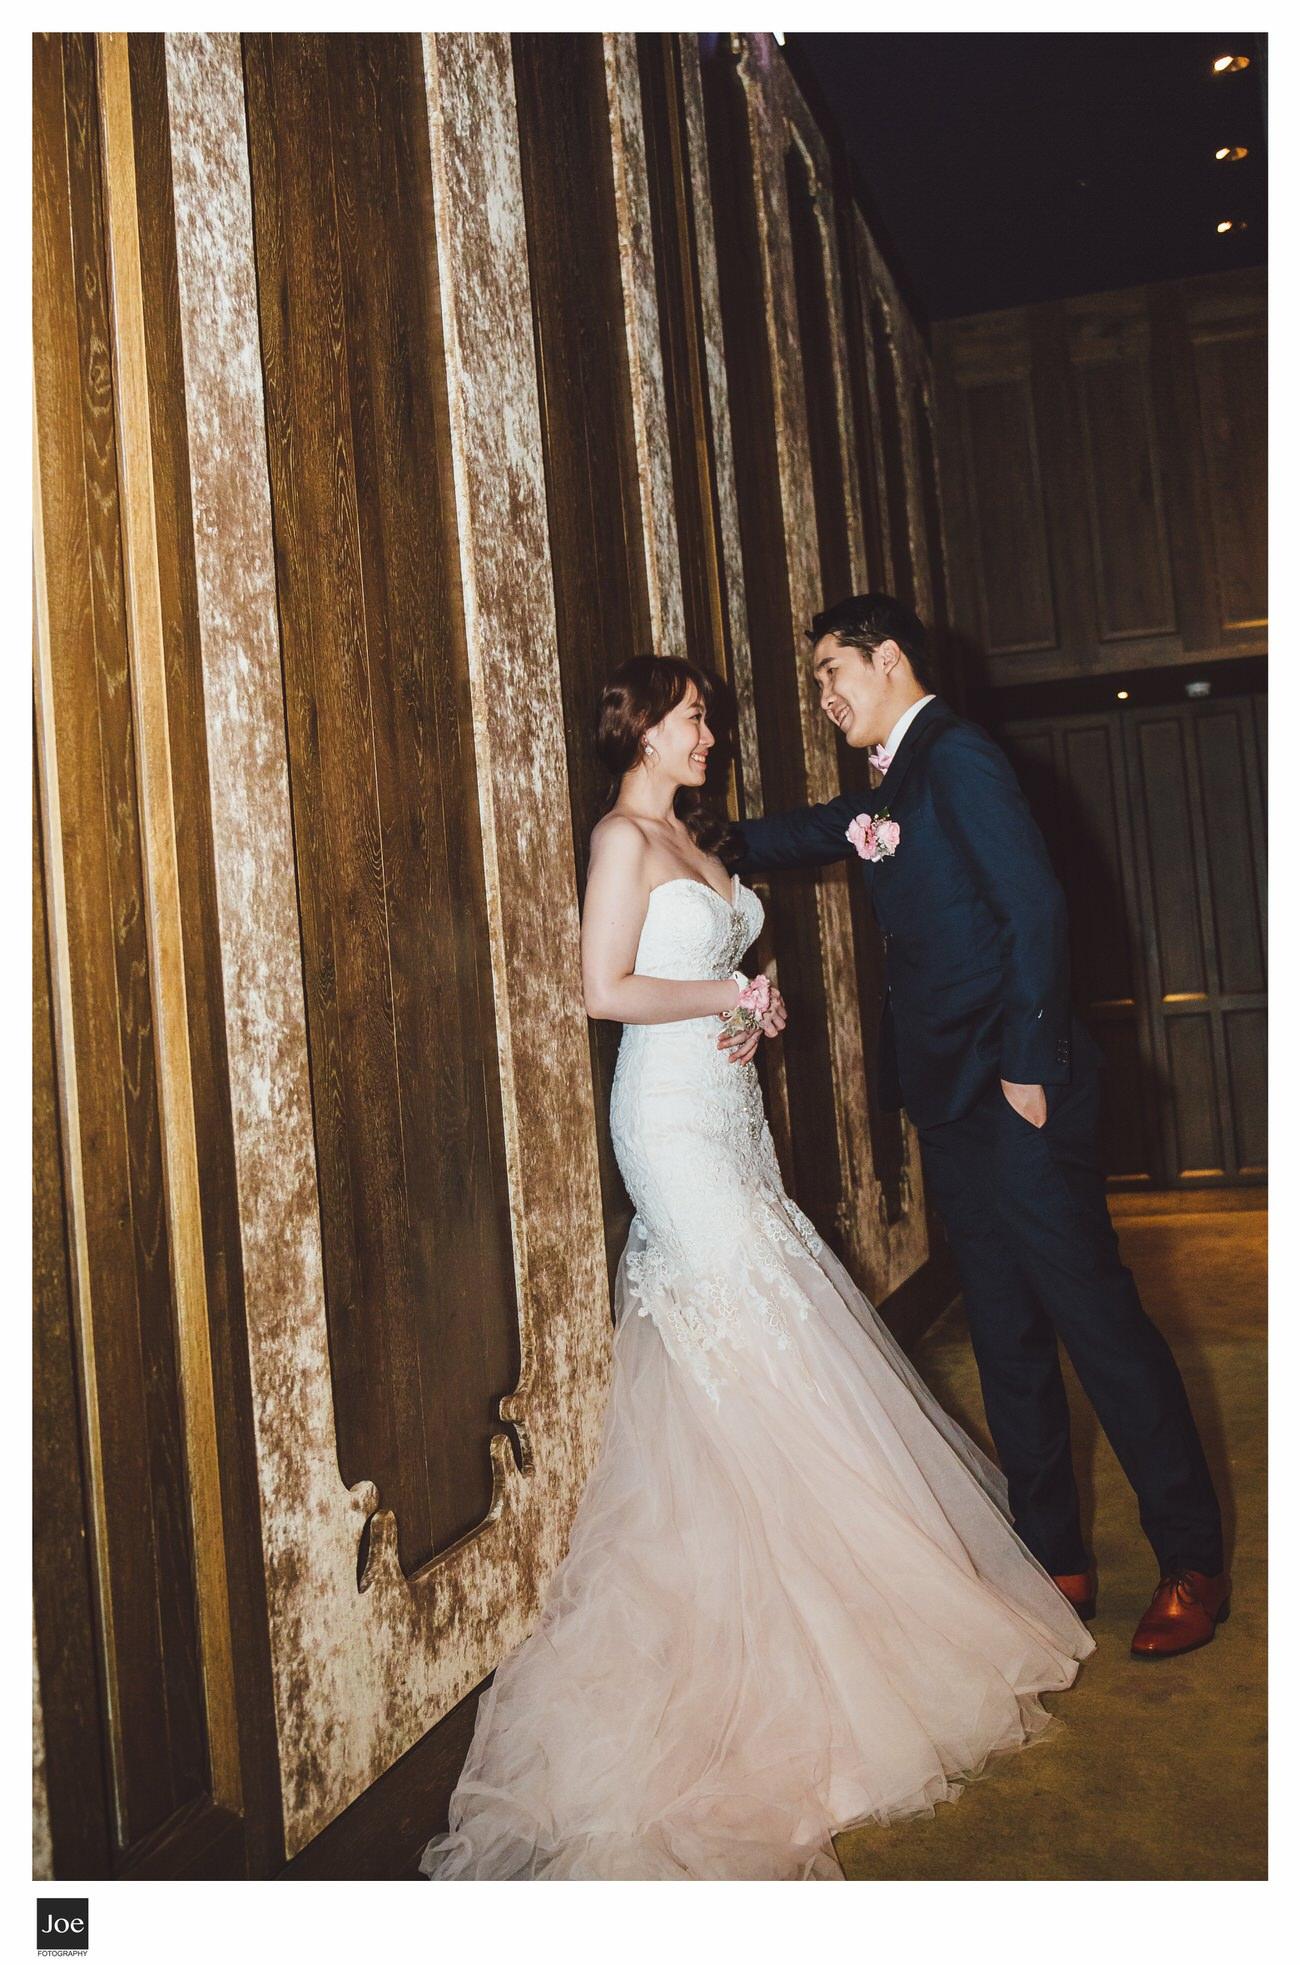 joe-fotography-wedding-photo-palais-de-chine-hotel-070.jpg